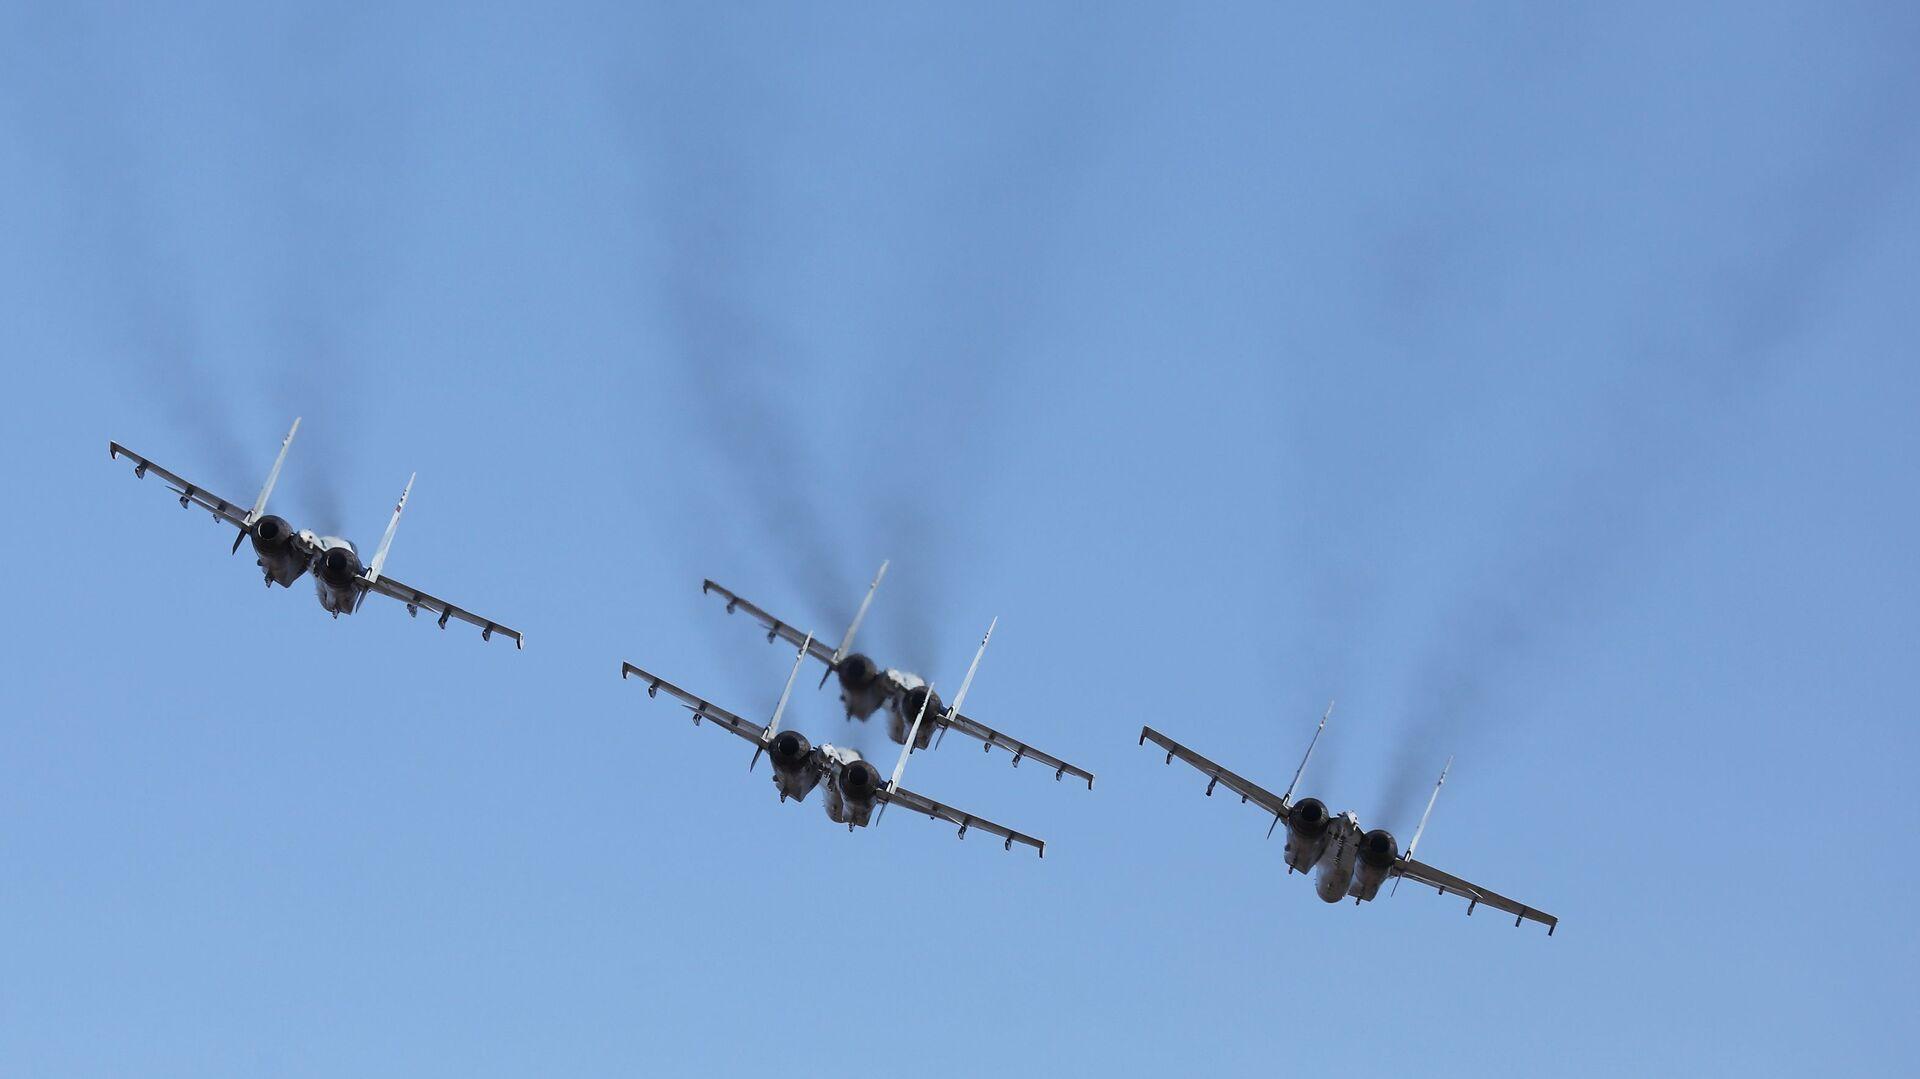 I caccia Su-35S - Sputnik Italia, 1920, 26.05.2021